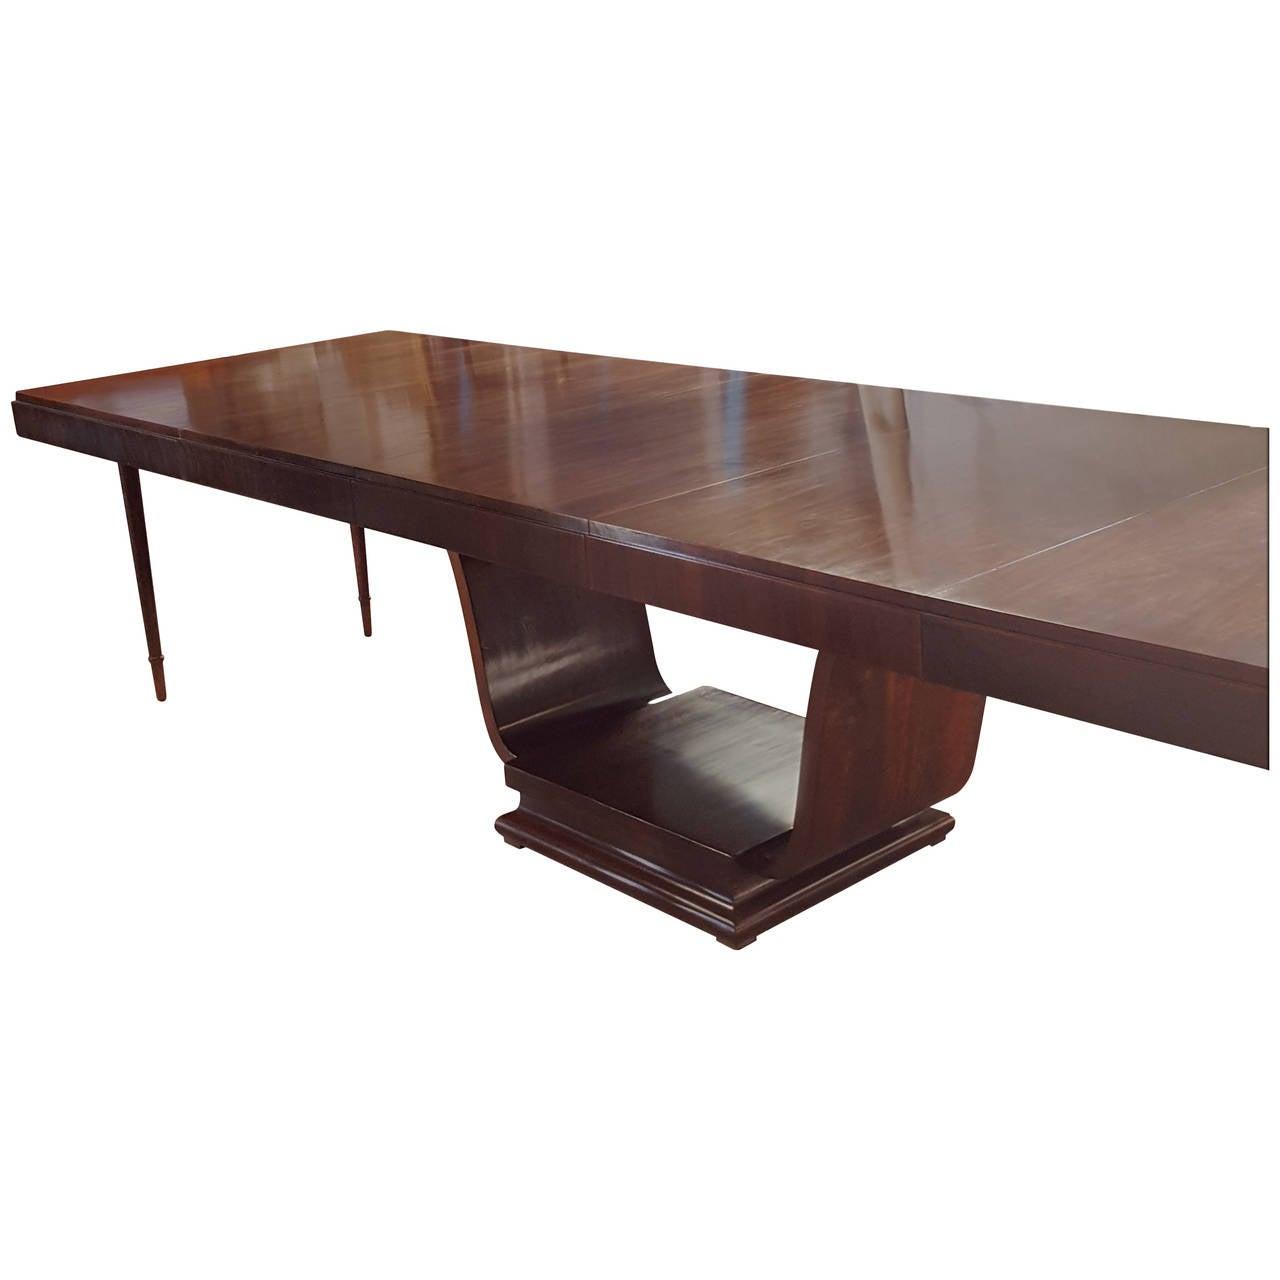 Huge Art Deco Walnut Dining Table with Three Extensions at  : 3093712l from www.1stdibs.com size 1280 x 1280 jpeg 55kB